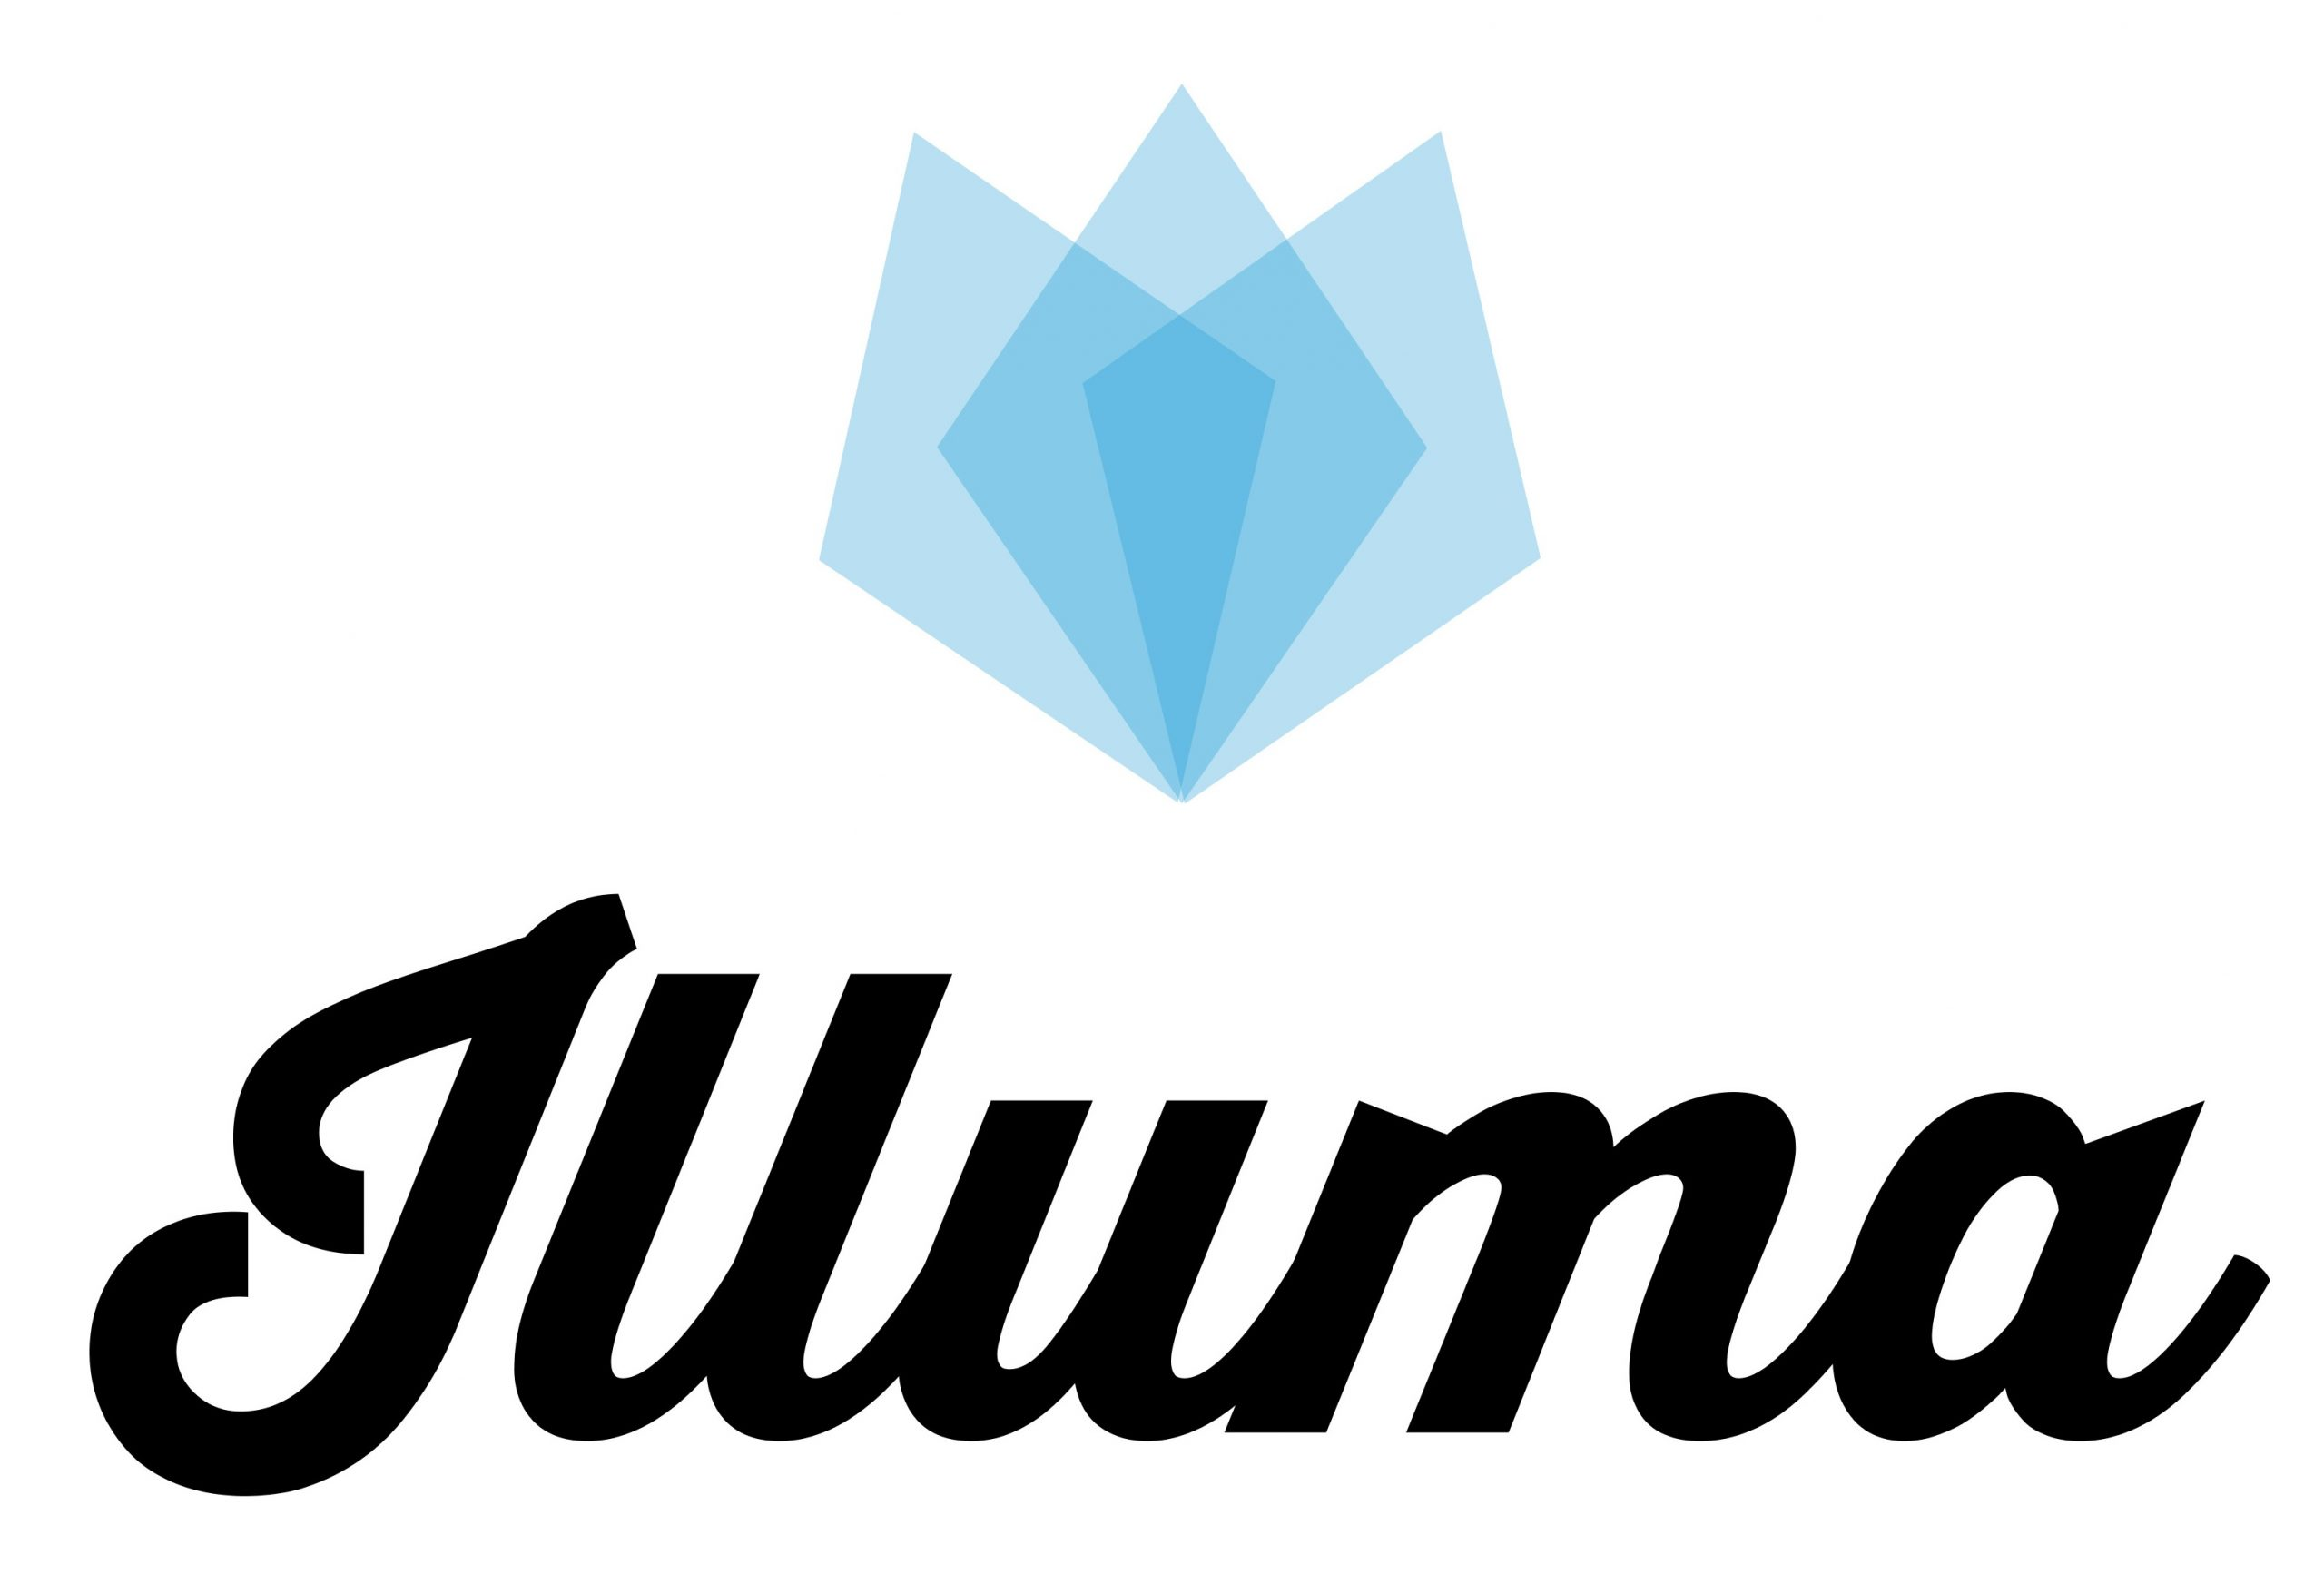 ILLUMA COMMUNICATIONS INC.